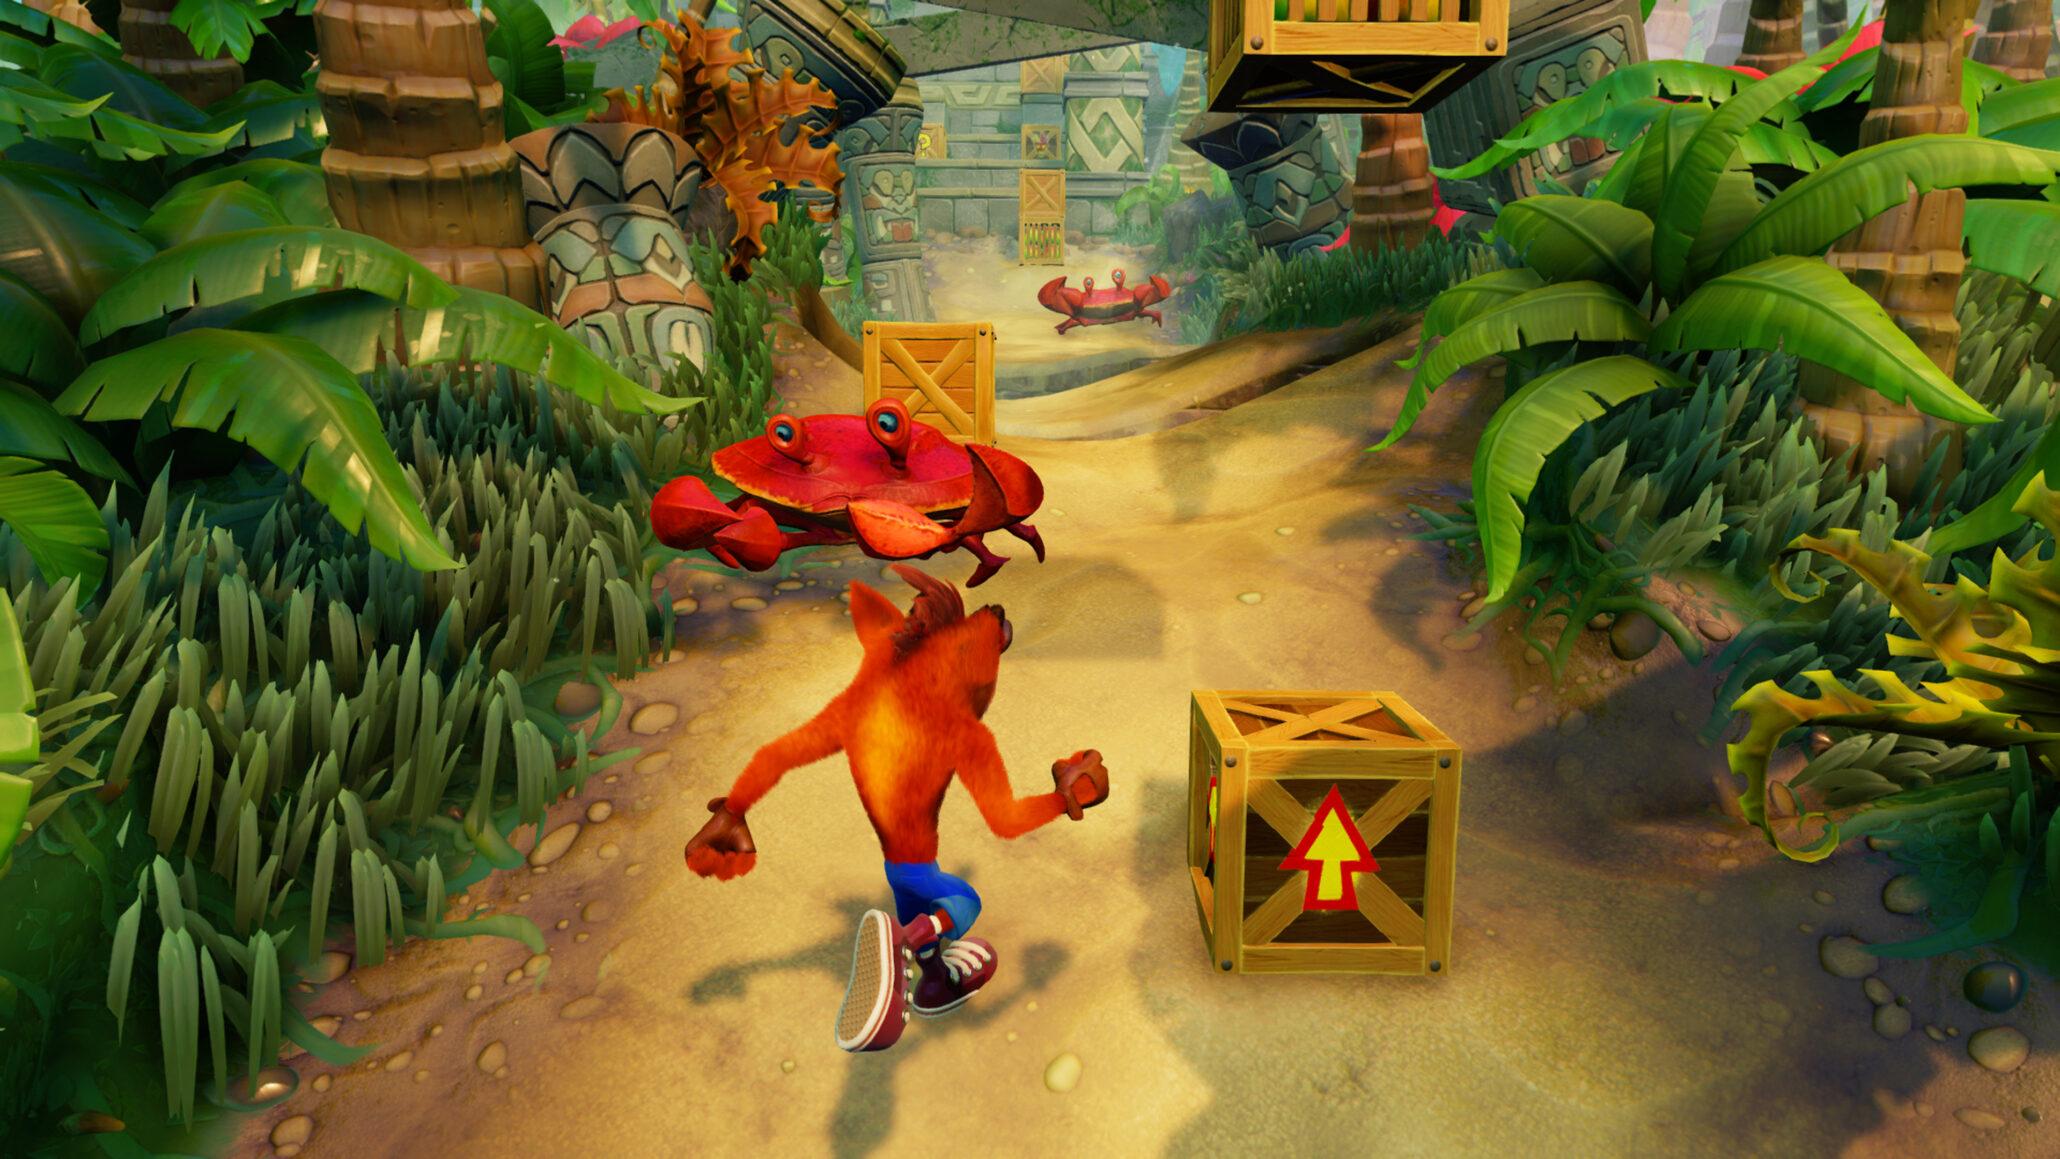 Crash Bandicoot N Sane Trilogy Runs at 1440P@30FPS on PS4 Pro